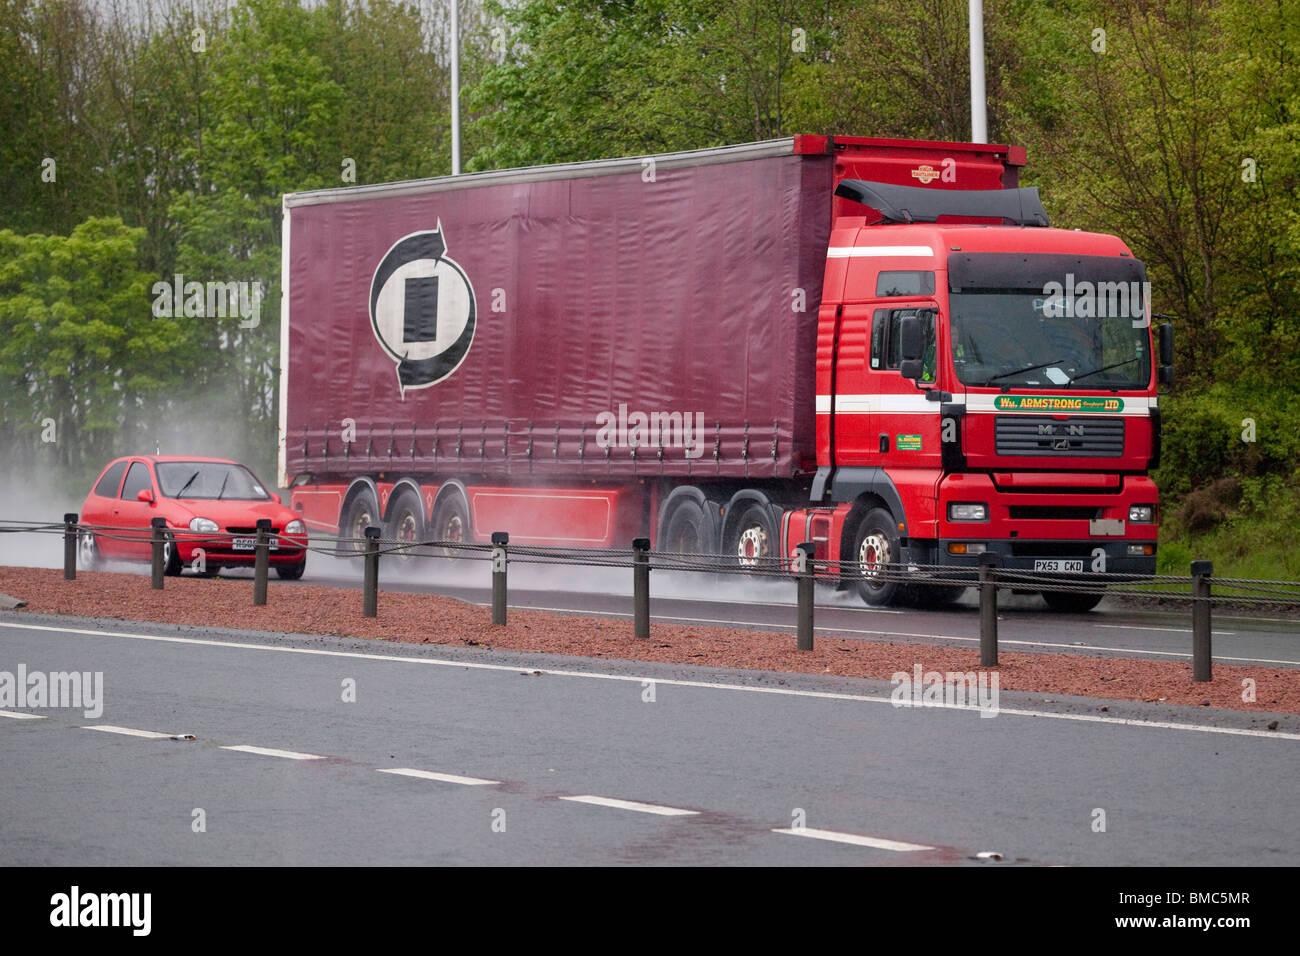 Dual carriageway road bad weather rain mist spray car overtaking a lorry rush hour traffic UK - Stock Image